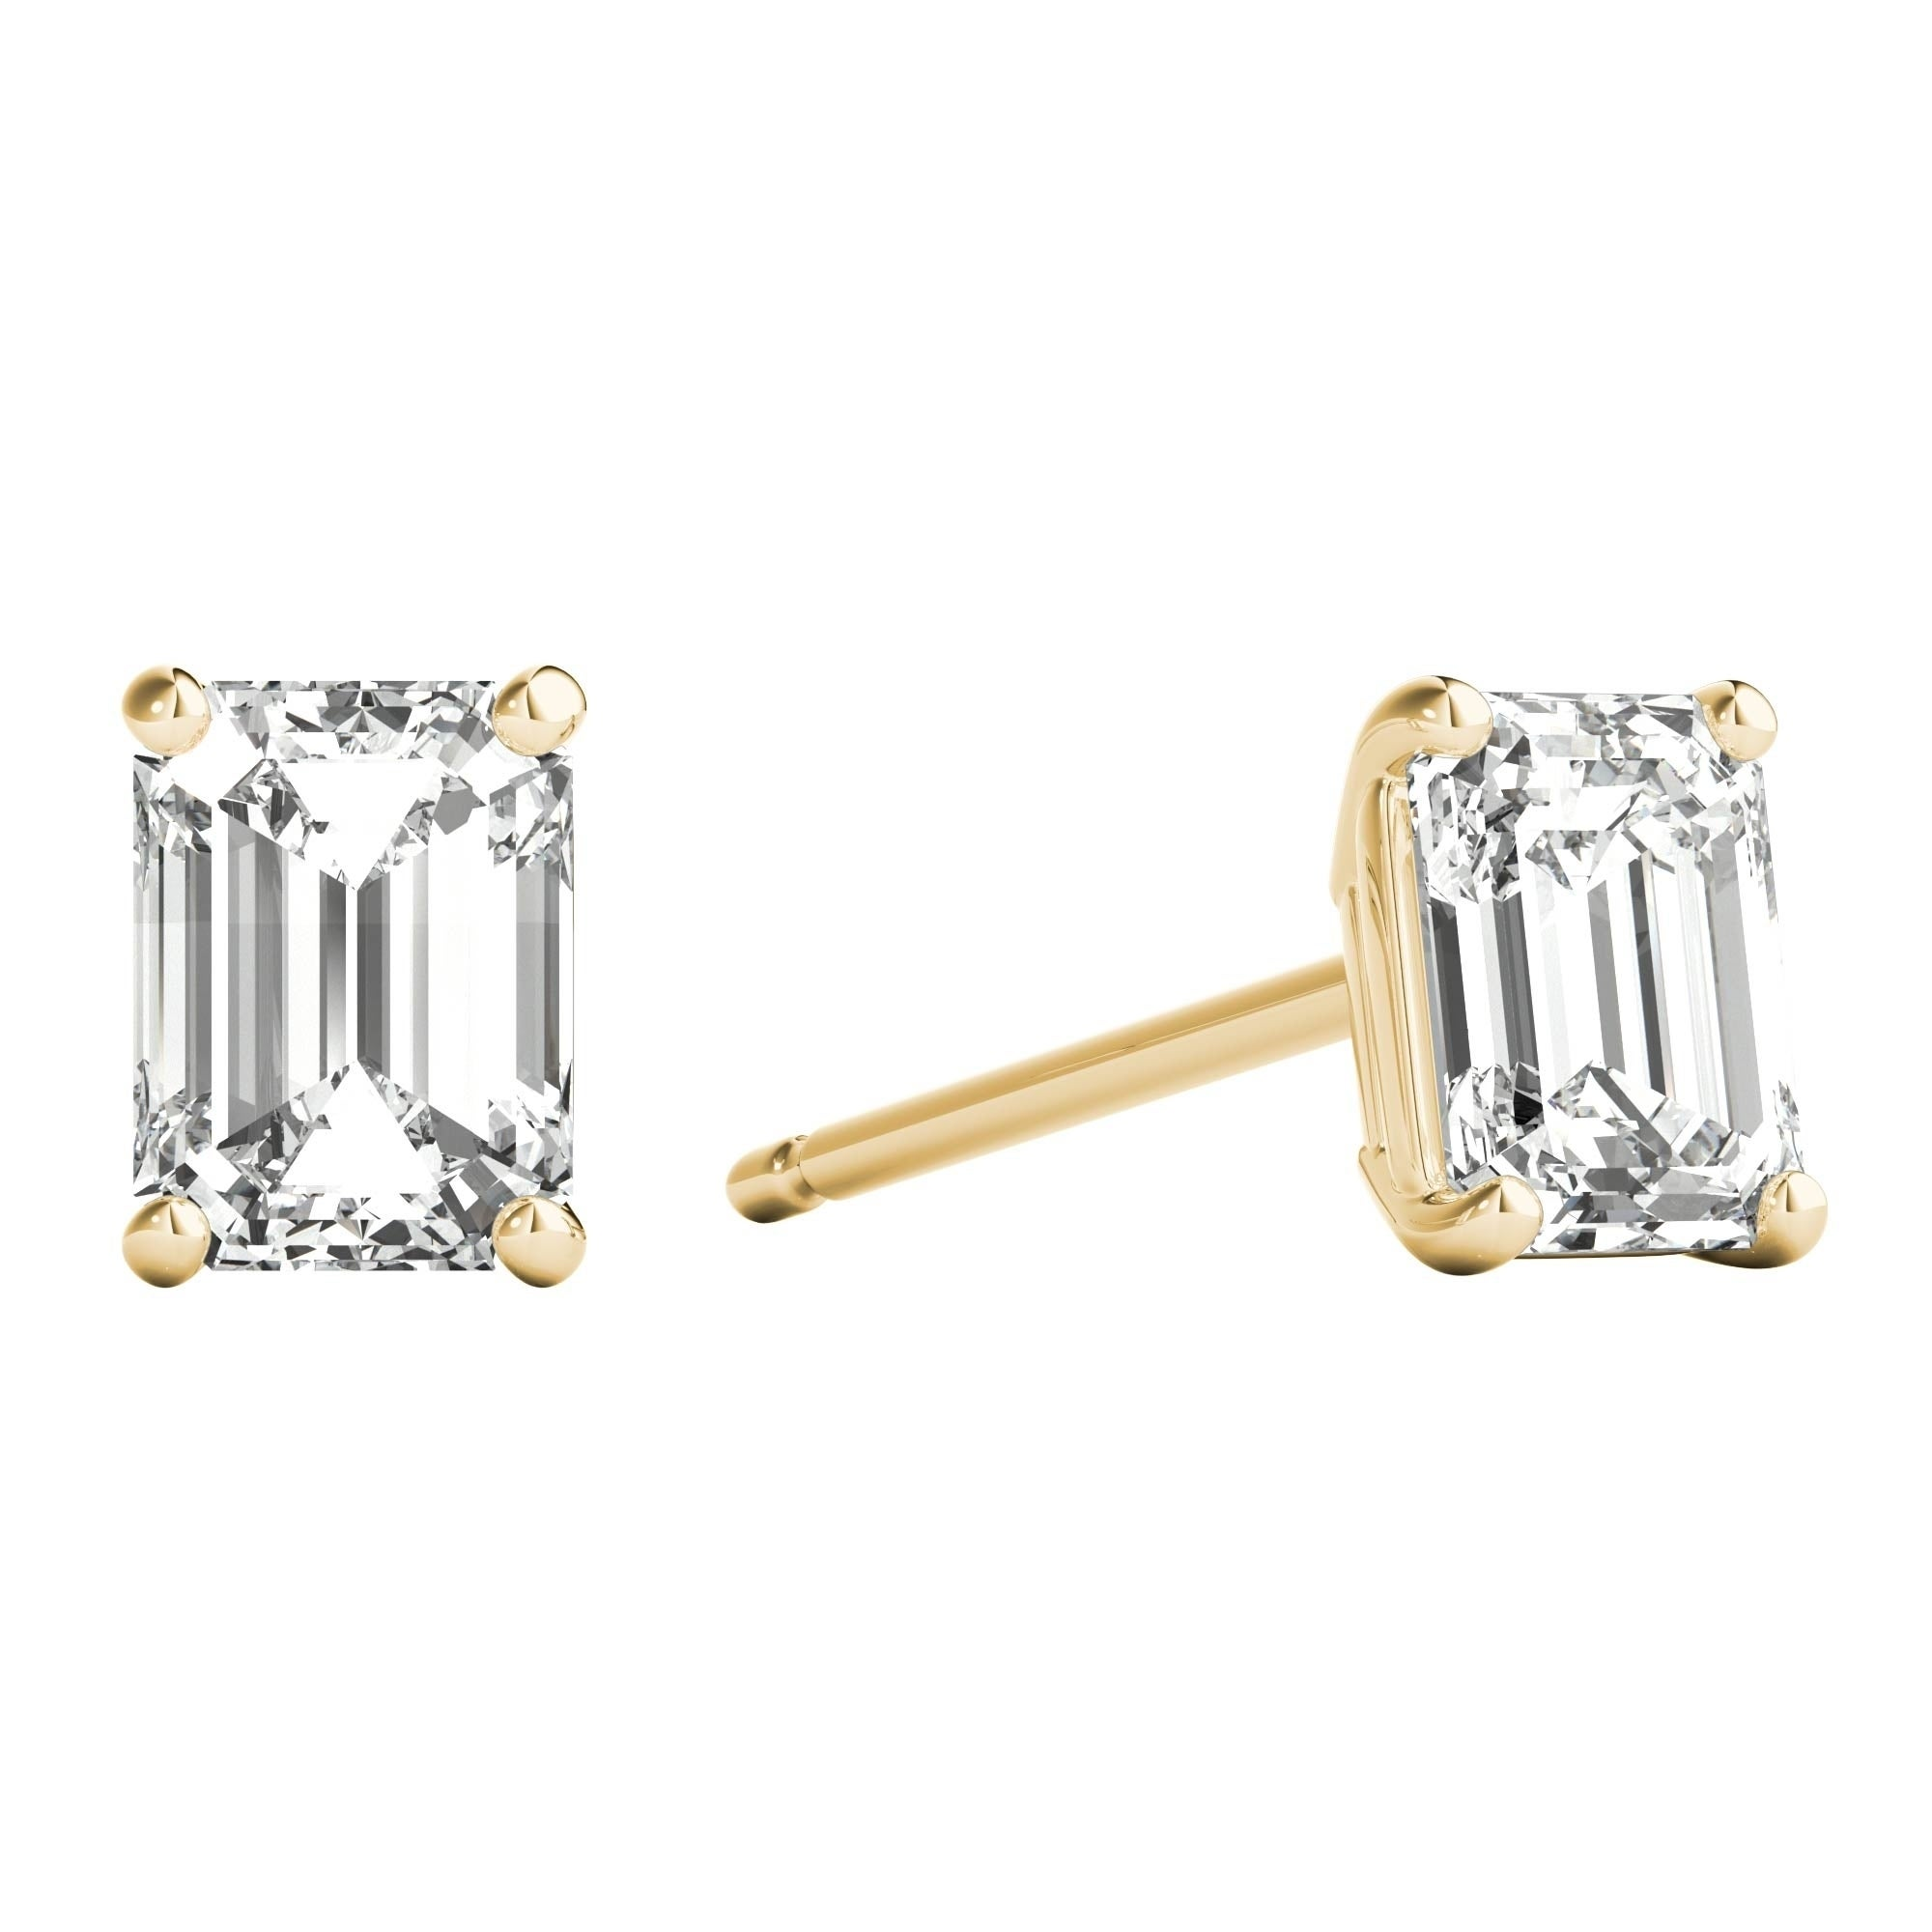 59eeee3d1 Seraphina 18k Gold 0.60ct TDW Emerald Cut Diamond Solitaire Stud Earrings